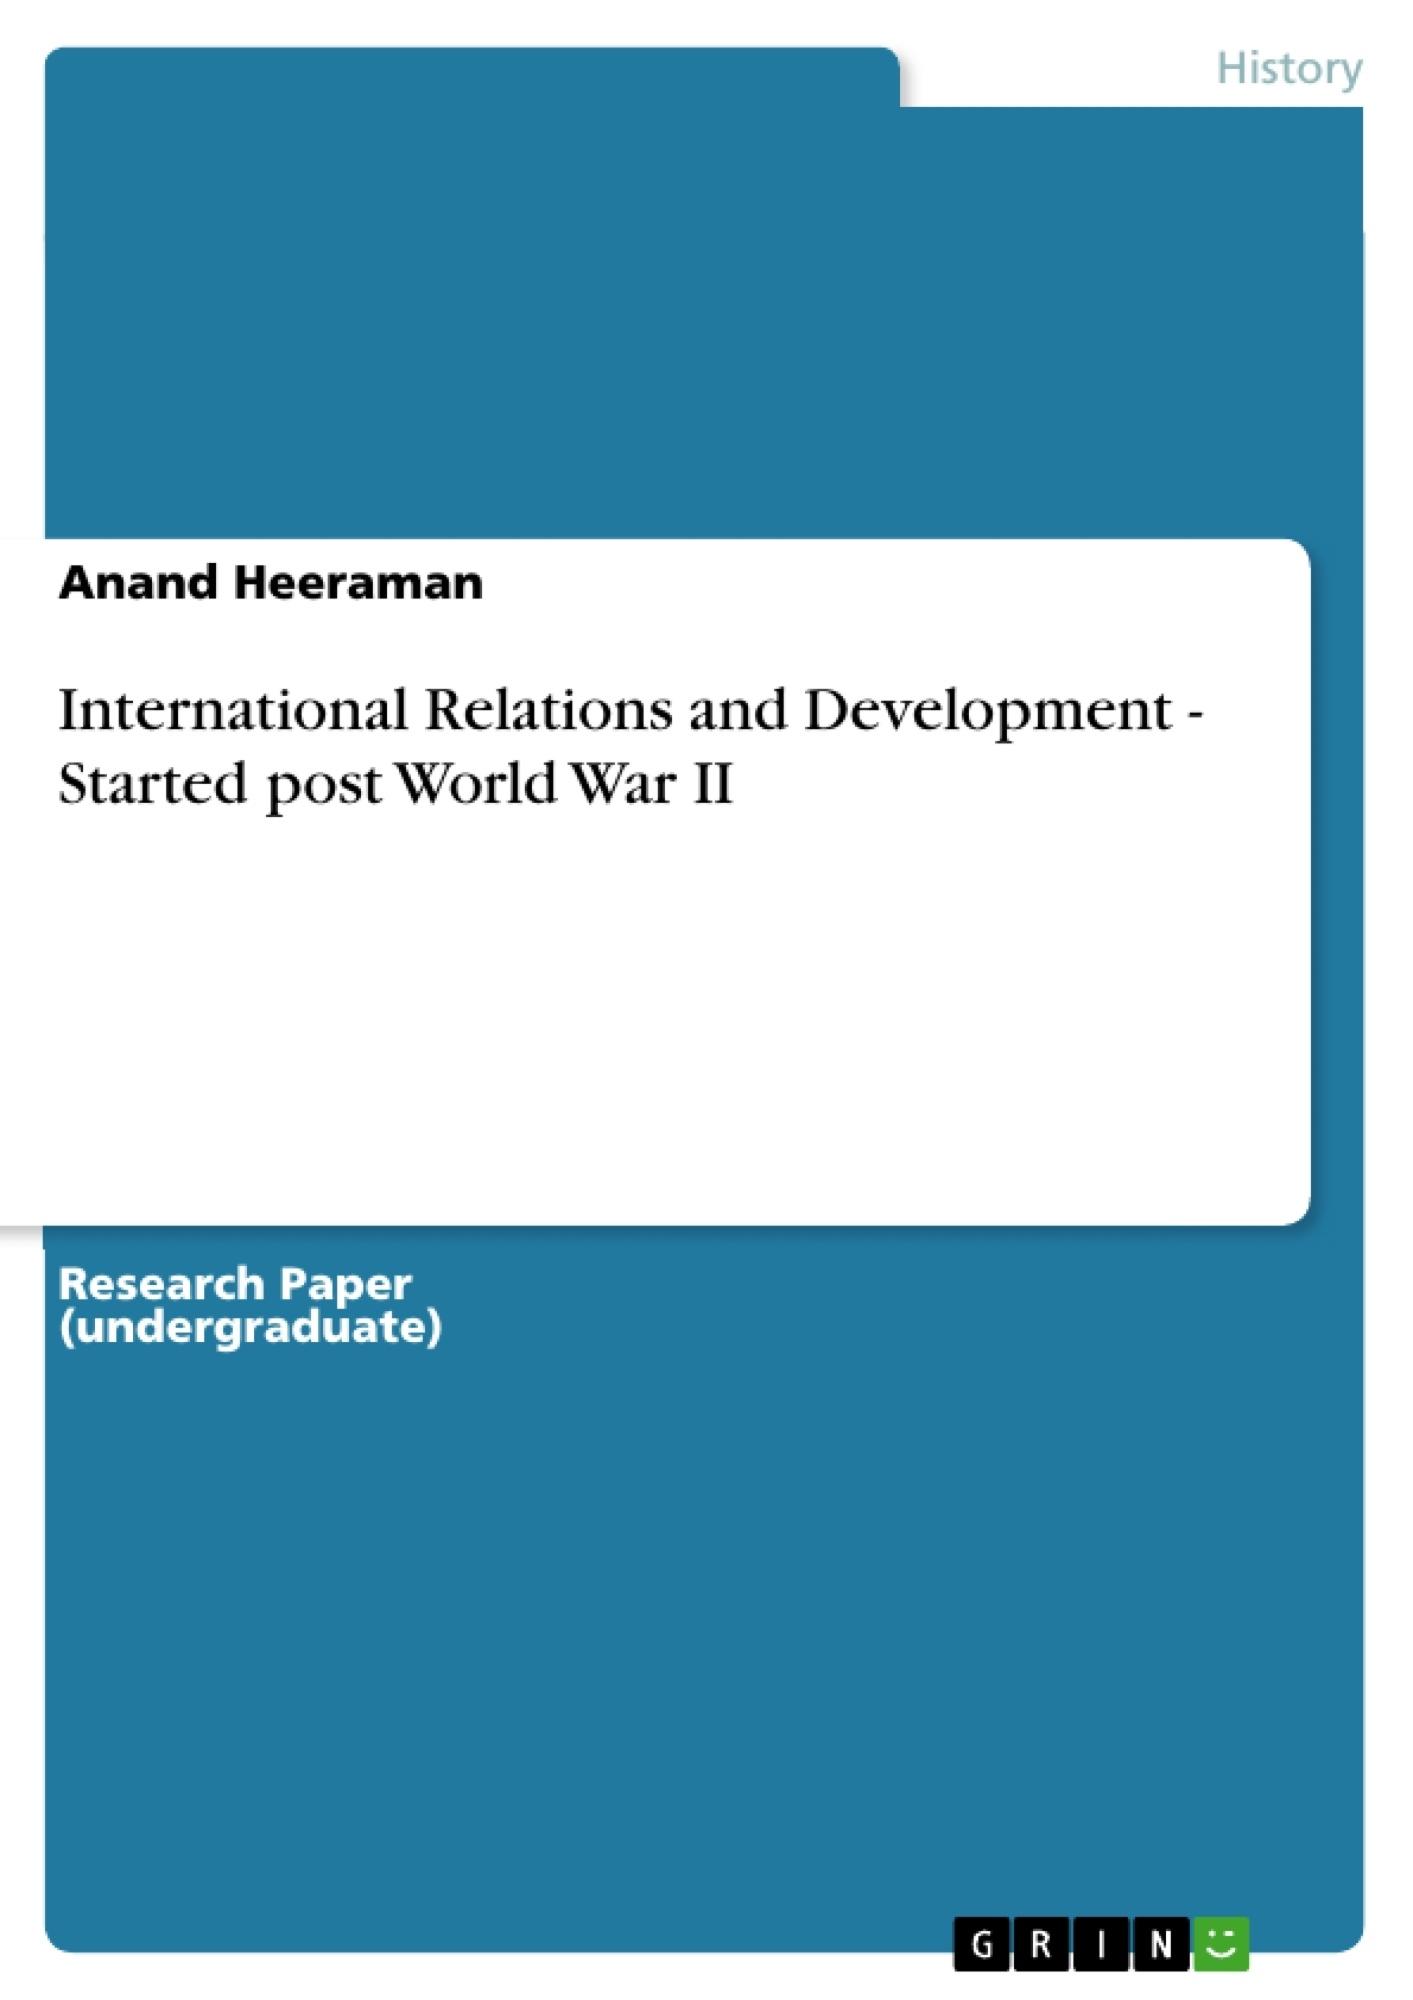 Title: International Relations and Development - Started post World War II